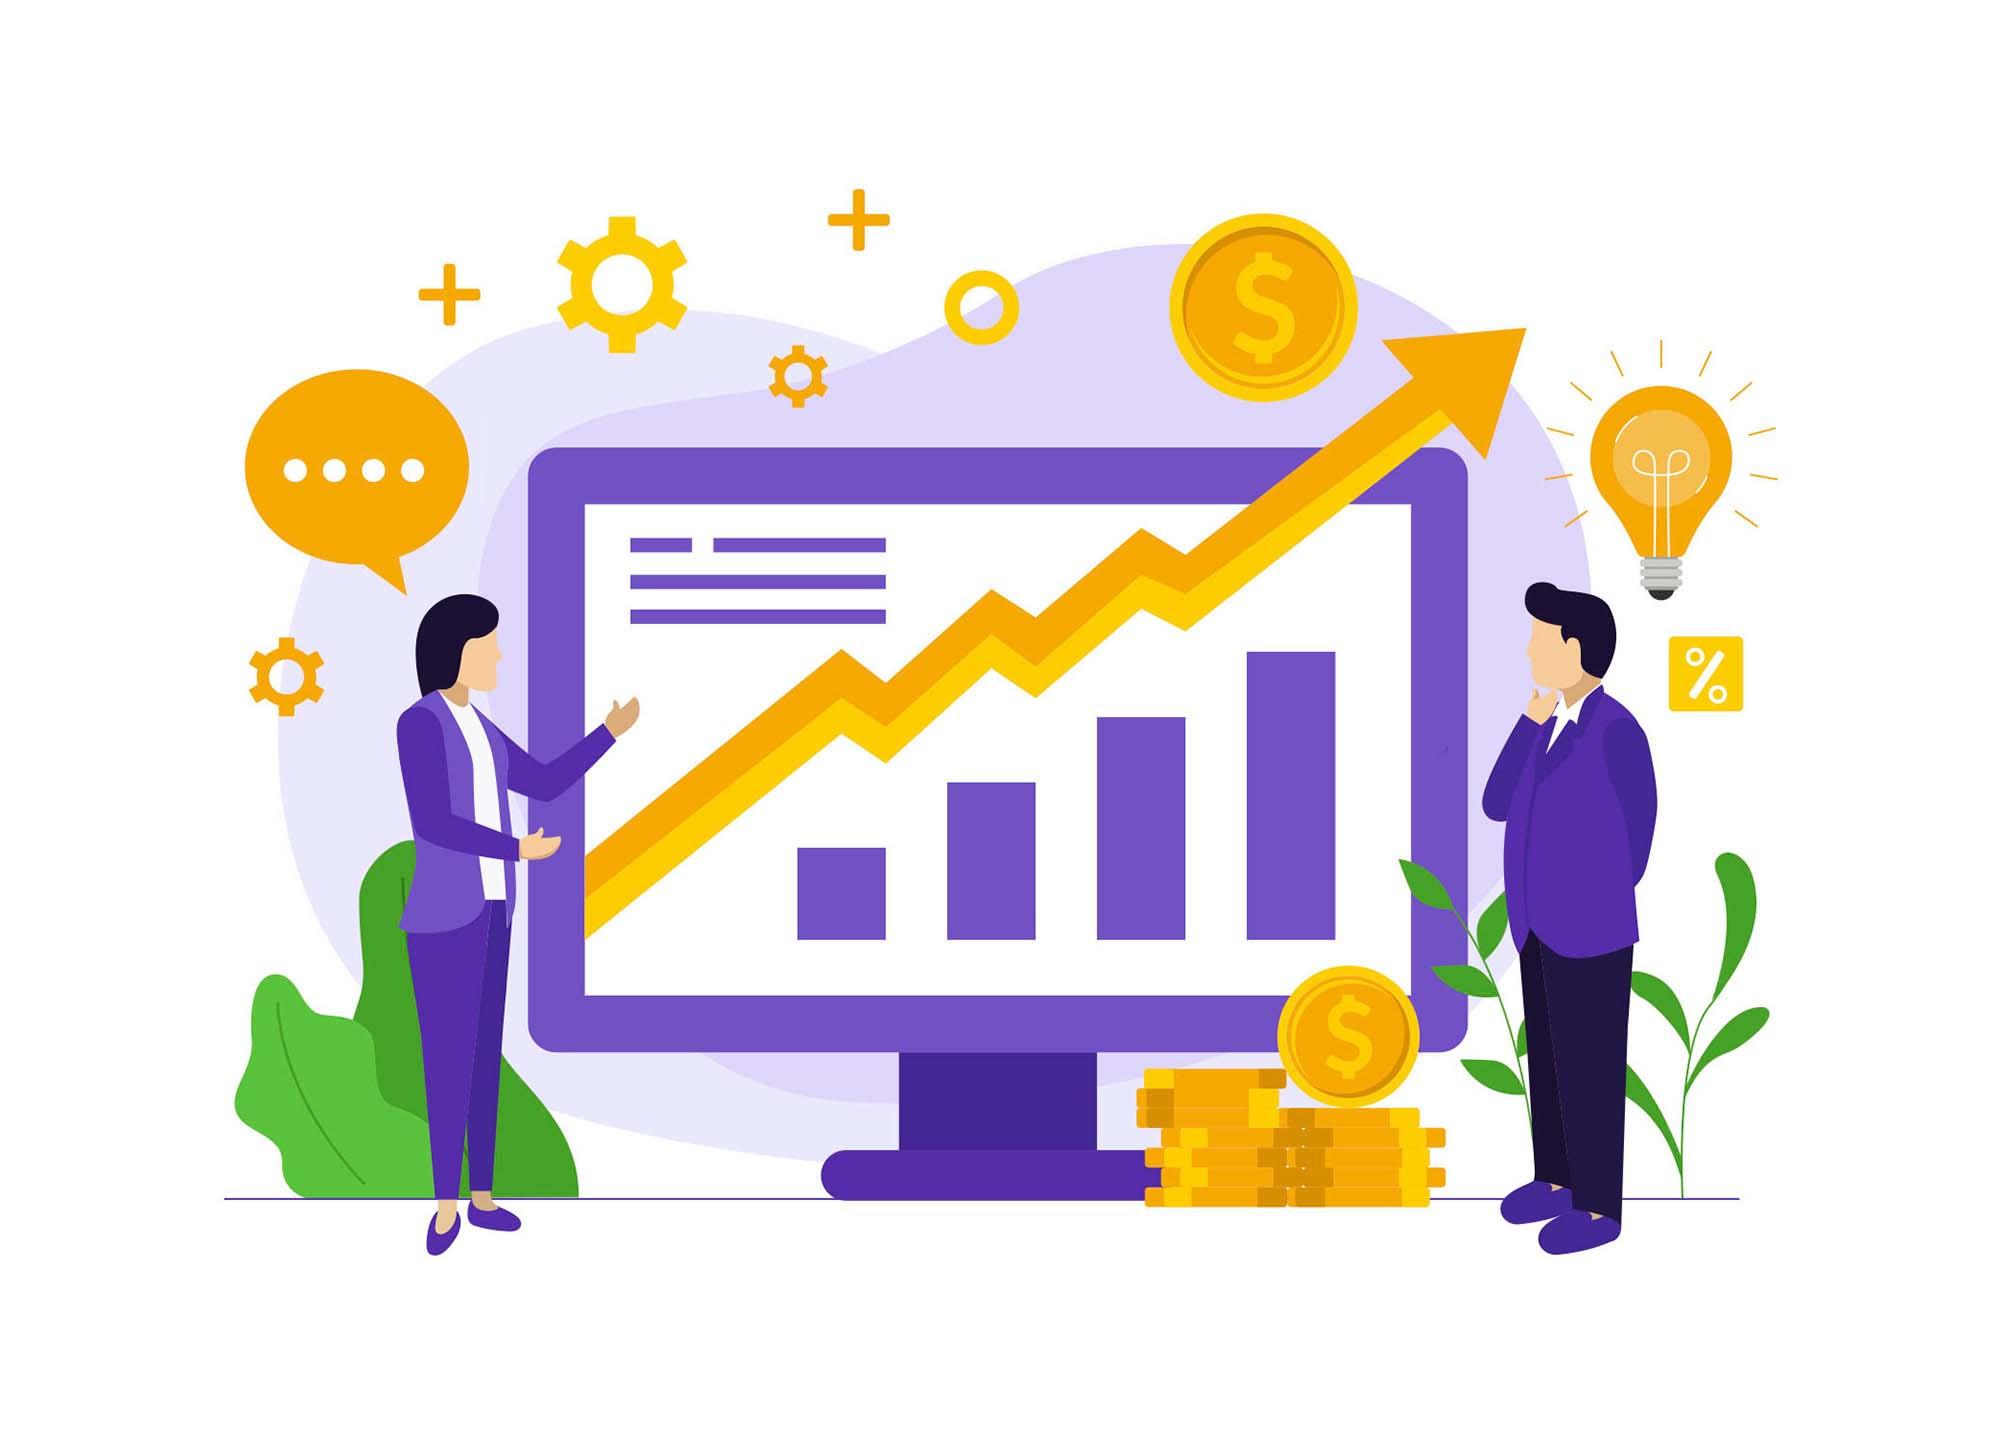 Business-Partnership-Illustration-1.jpg (2000×1440)